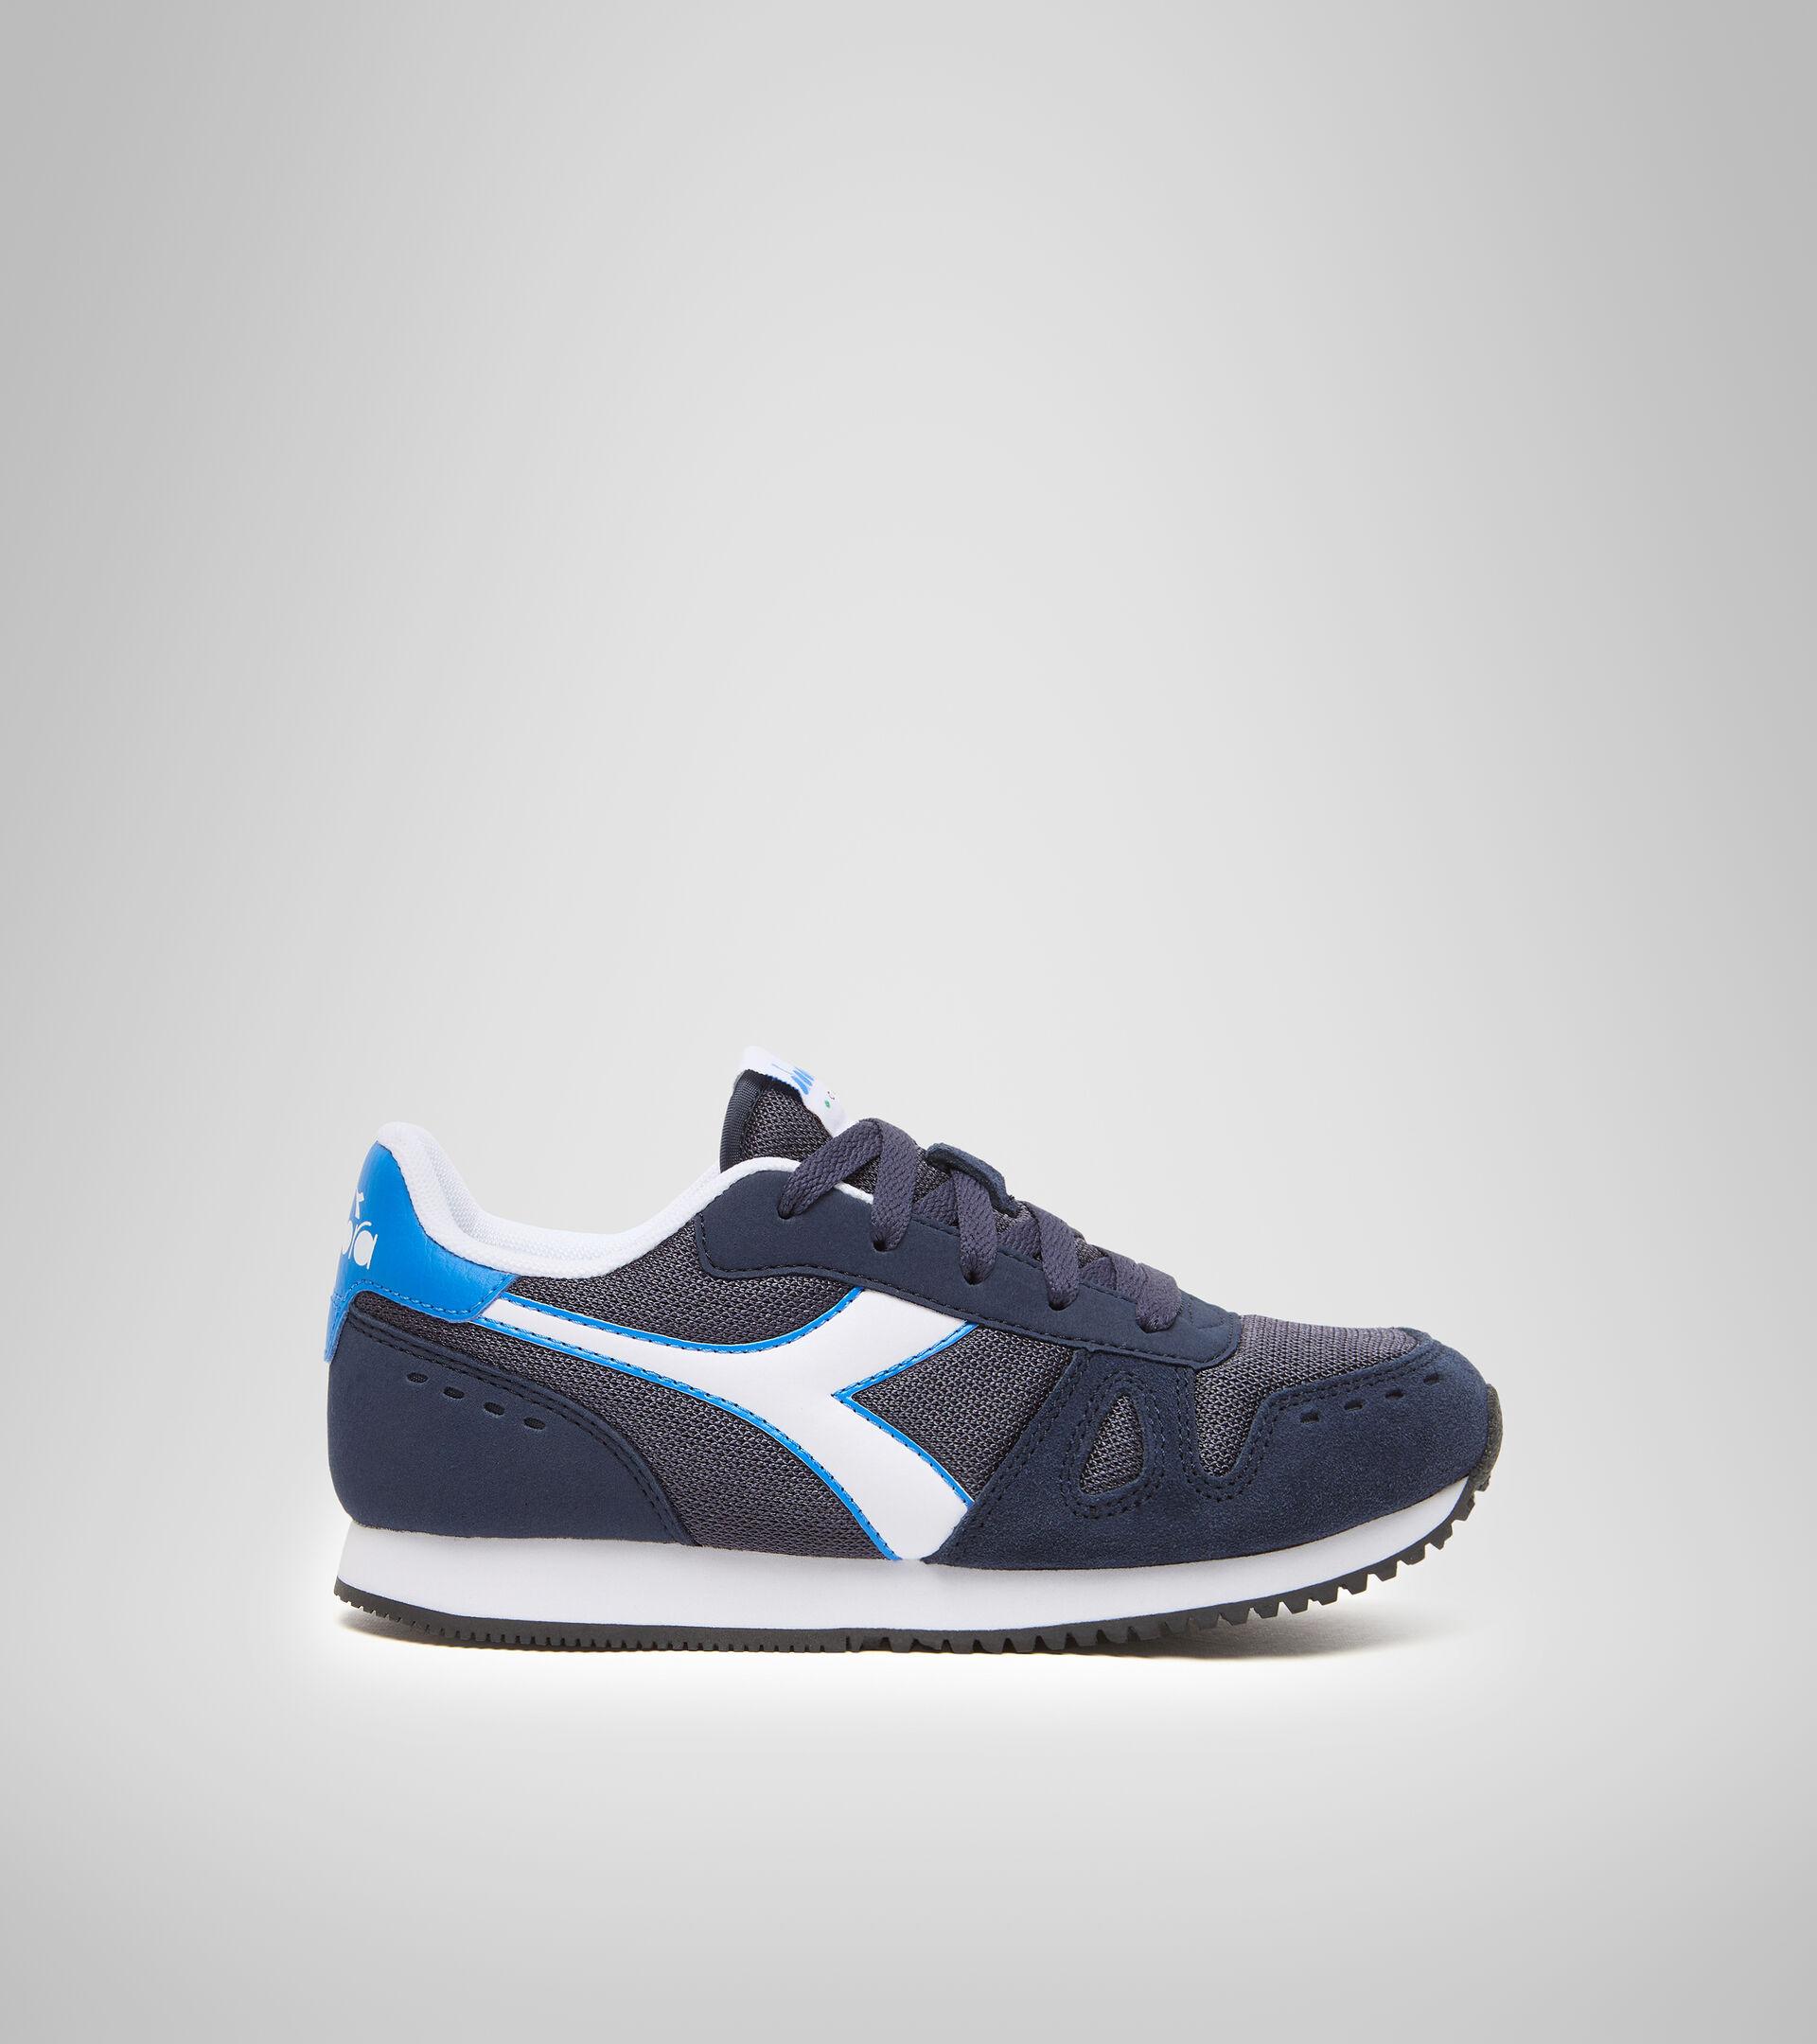 Footwear Sport BAMBINO SIMPLE RUN GS BLU CORSARO Diadora